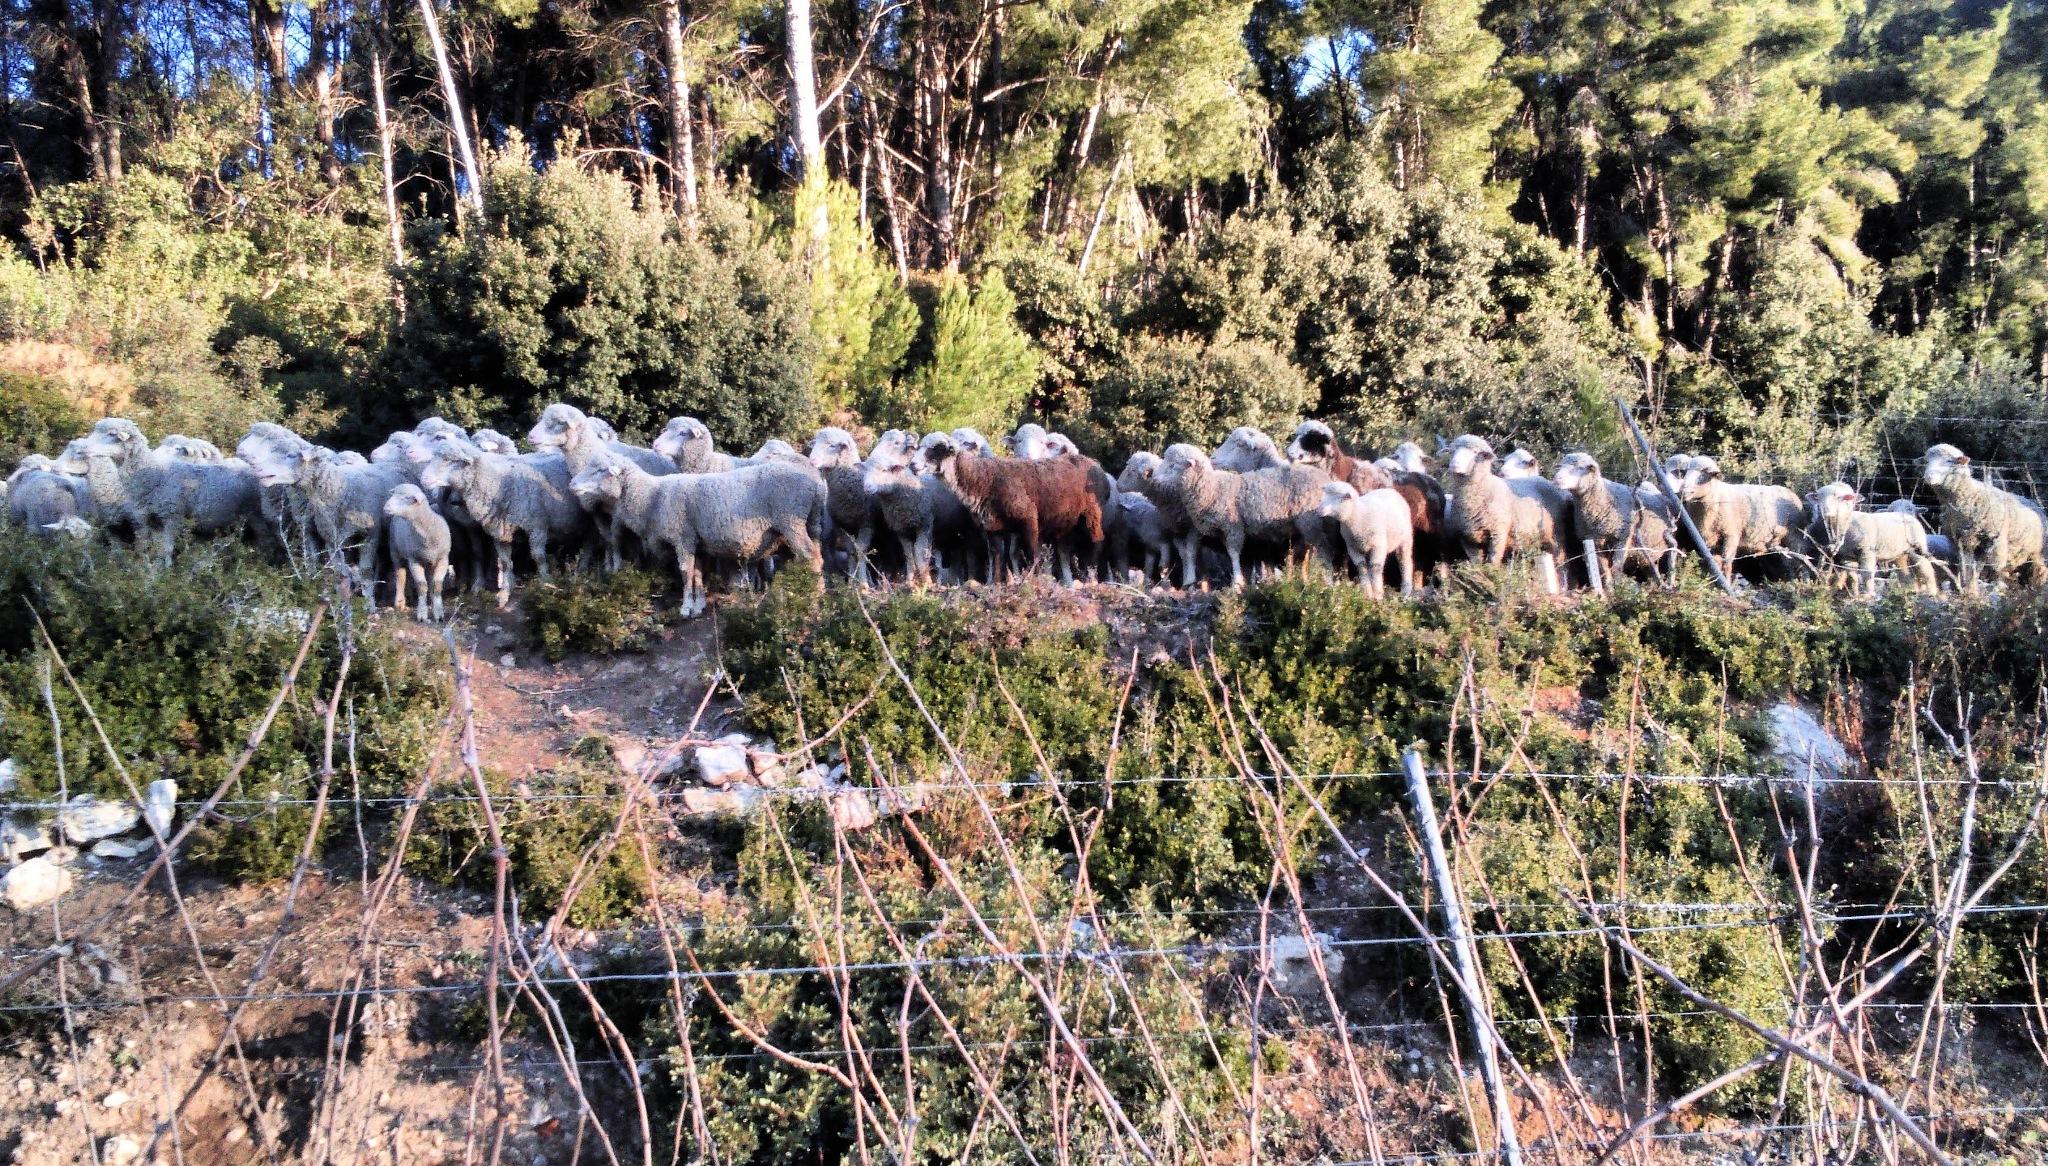 sheep by Sam Bacx